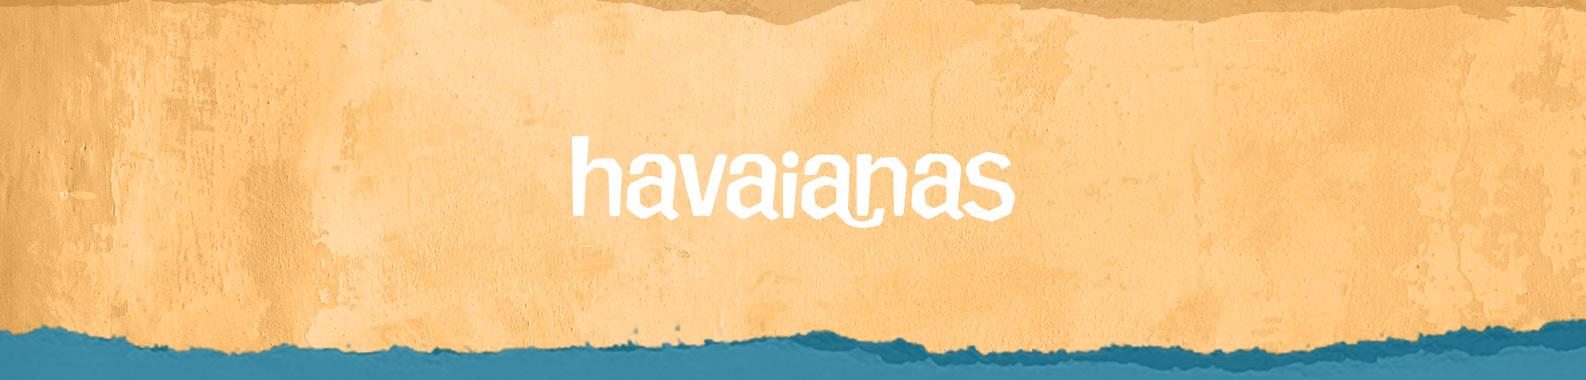 Havaianas brand header image